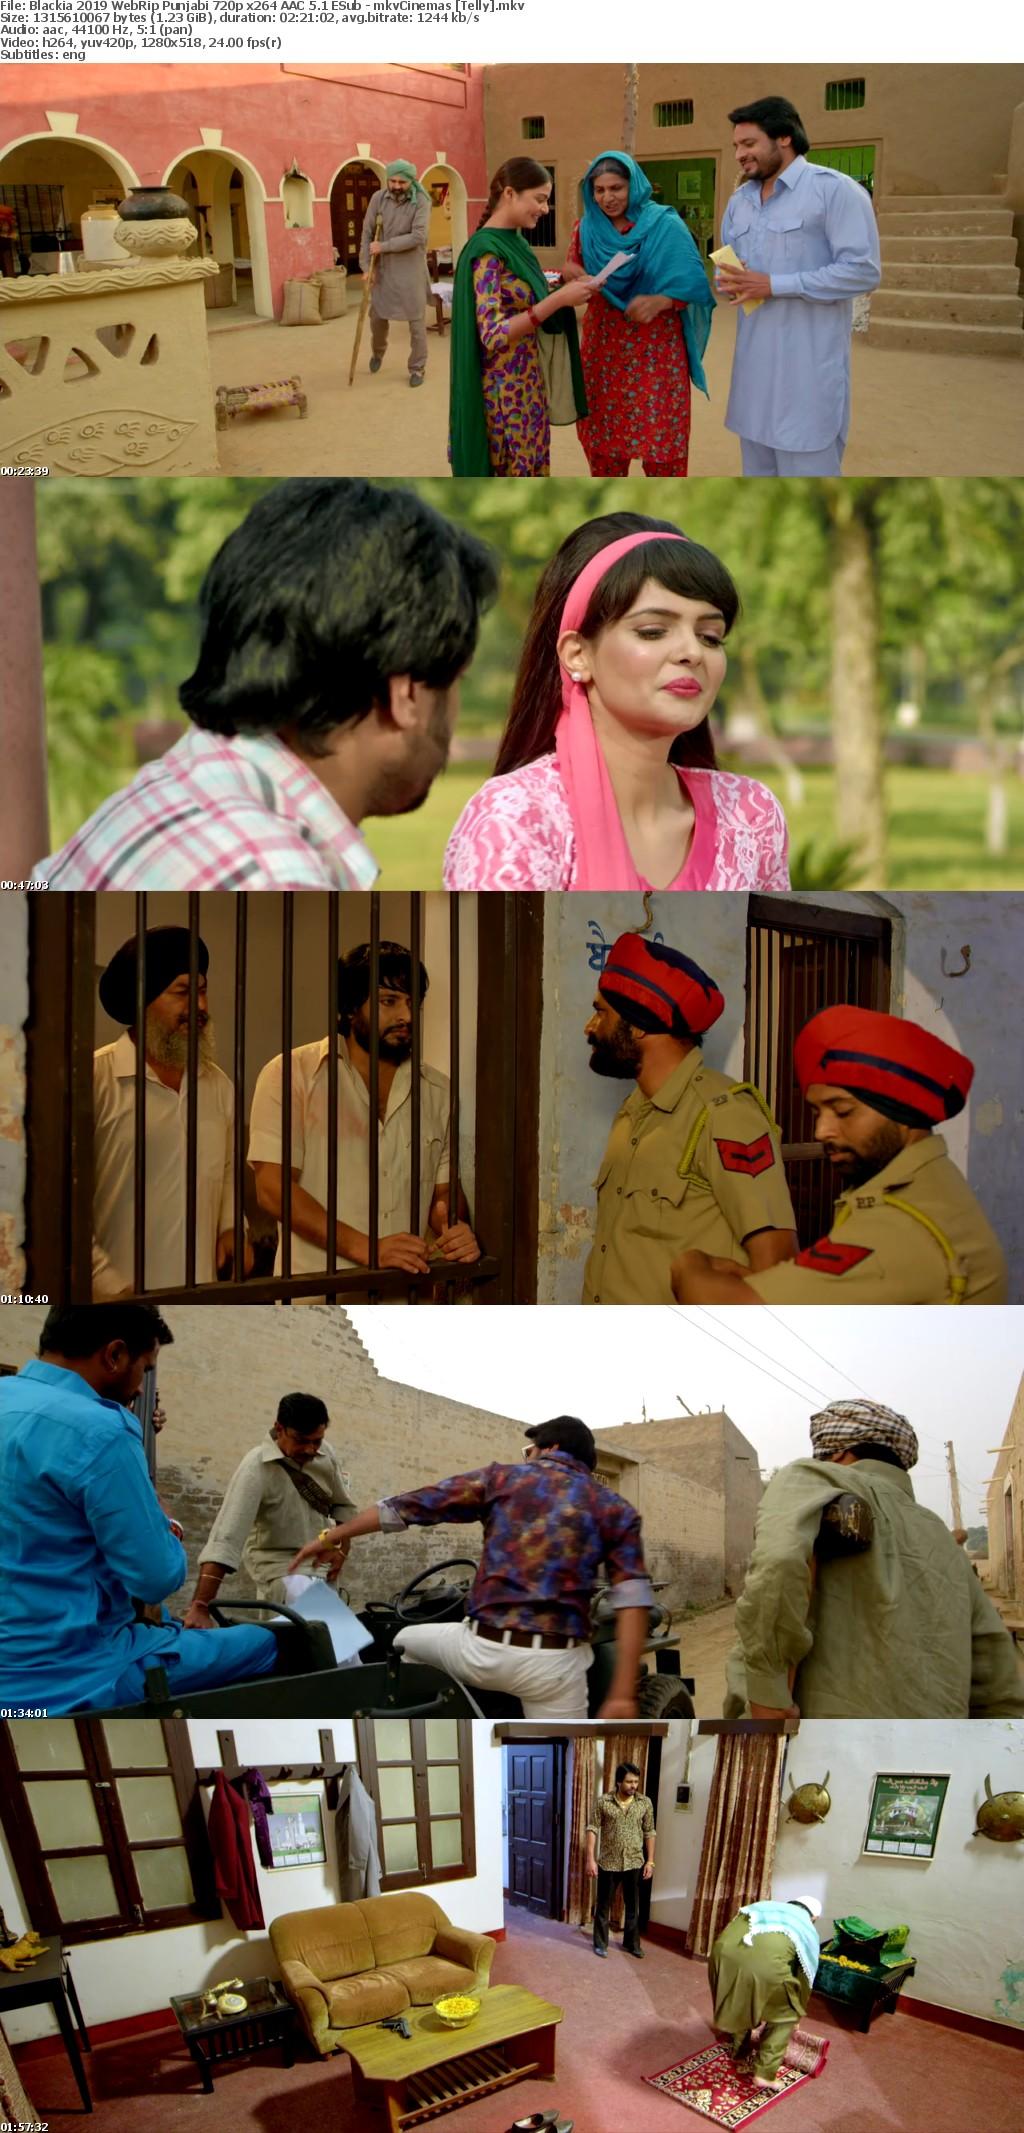 Blackia 2019 WebRip Punjabi 720p x264 AAC 5 1 ESub - mkvCinemas [Telly]